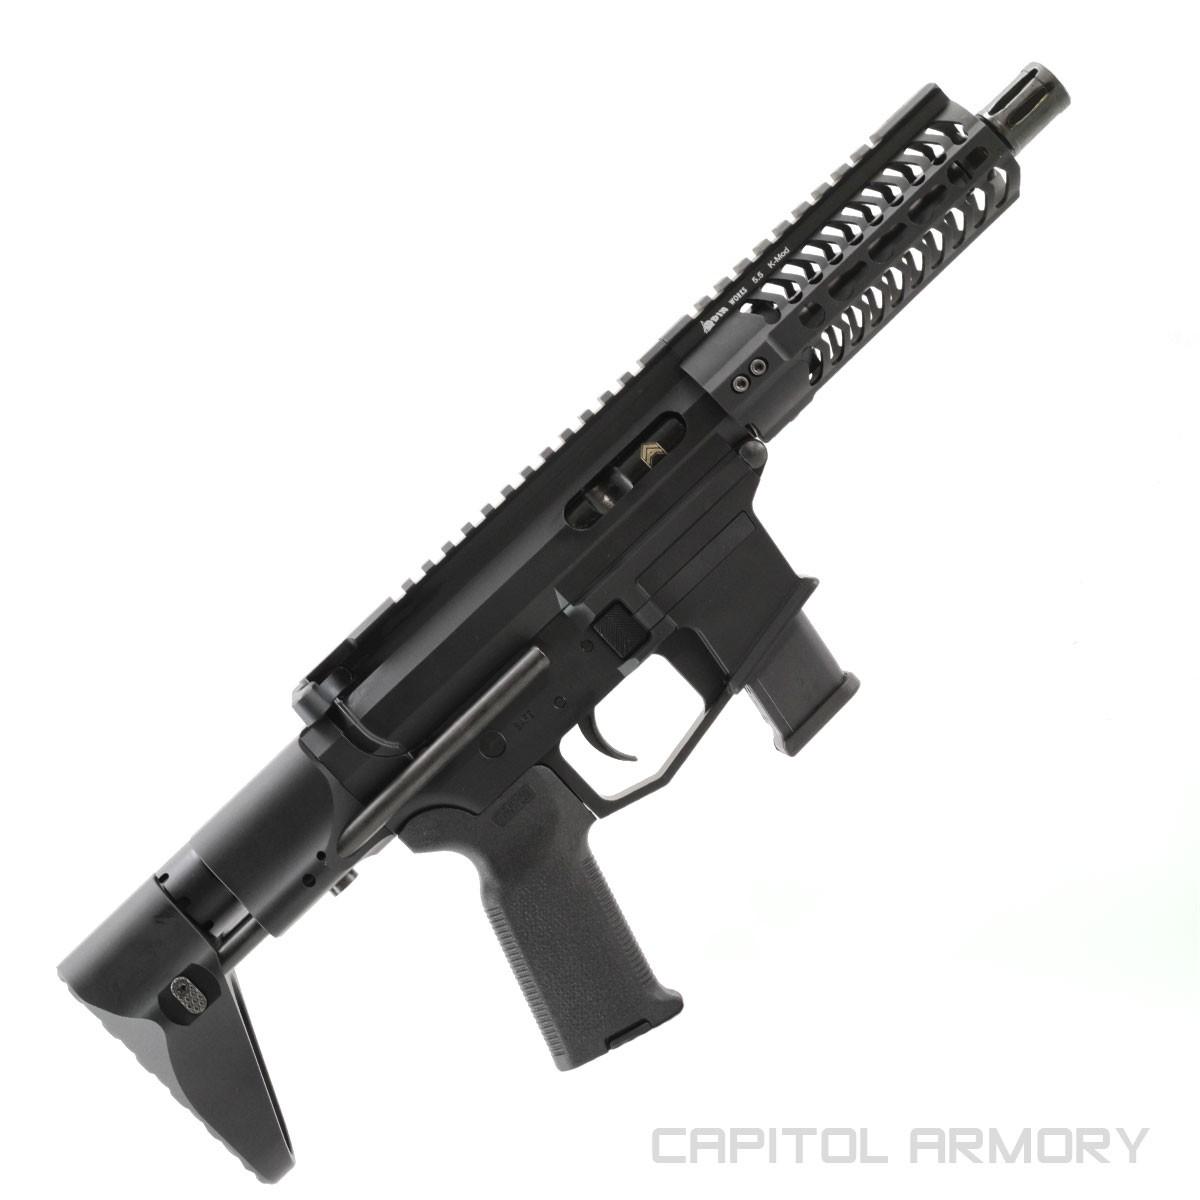 Angstadt Arms UDP9 PDW SBR